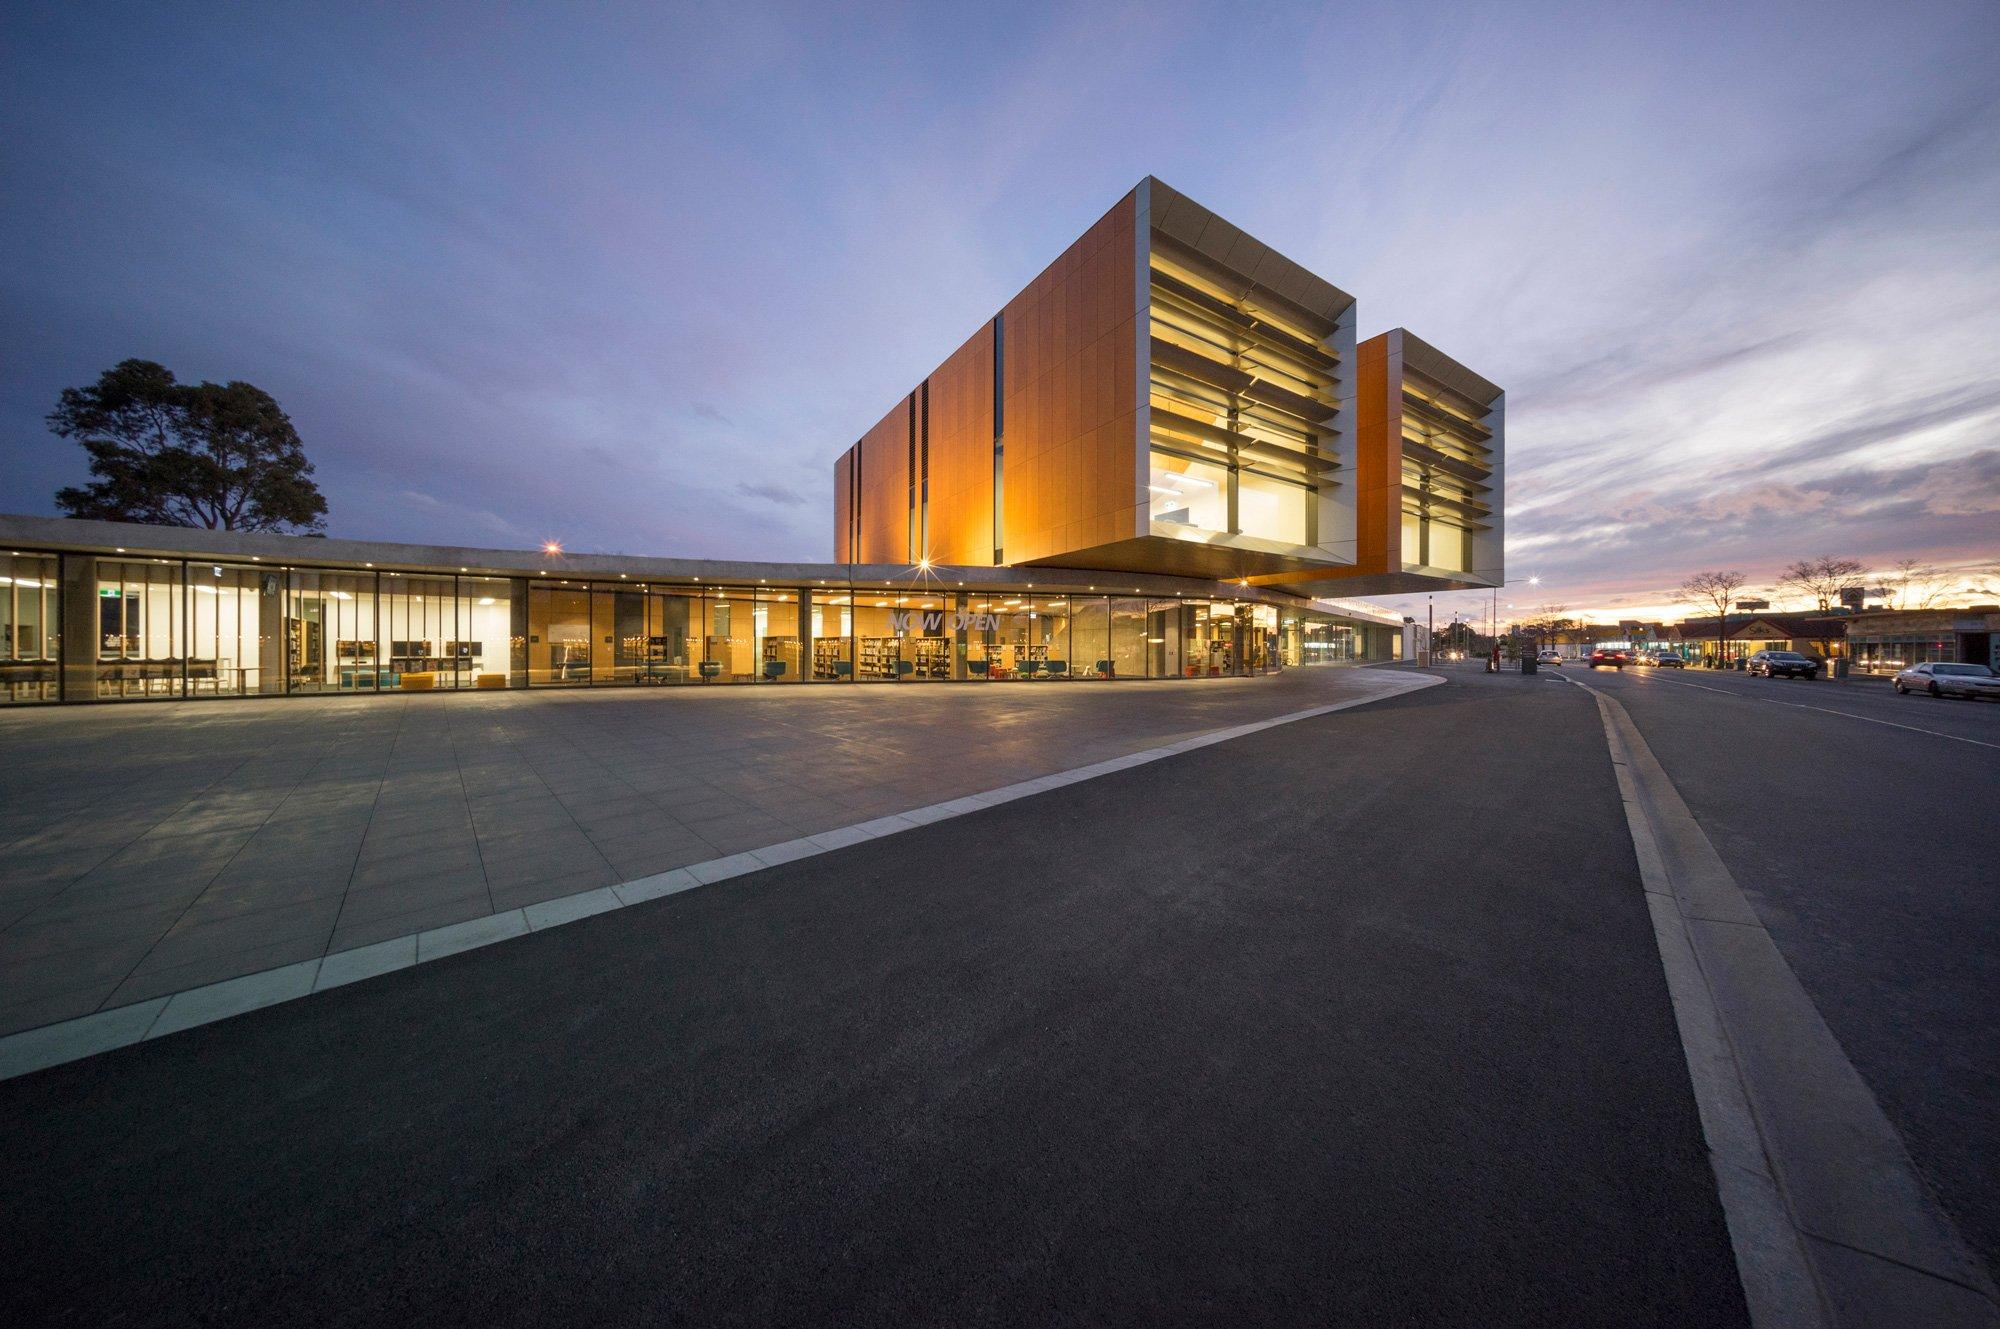 Frank Bartlett Library and Service Centre, FJMT © John Gollings